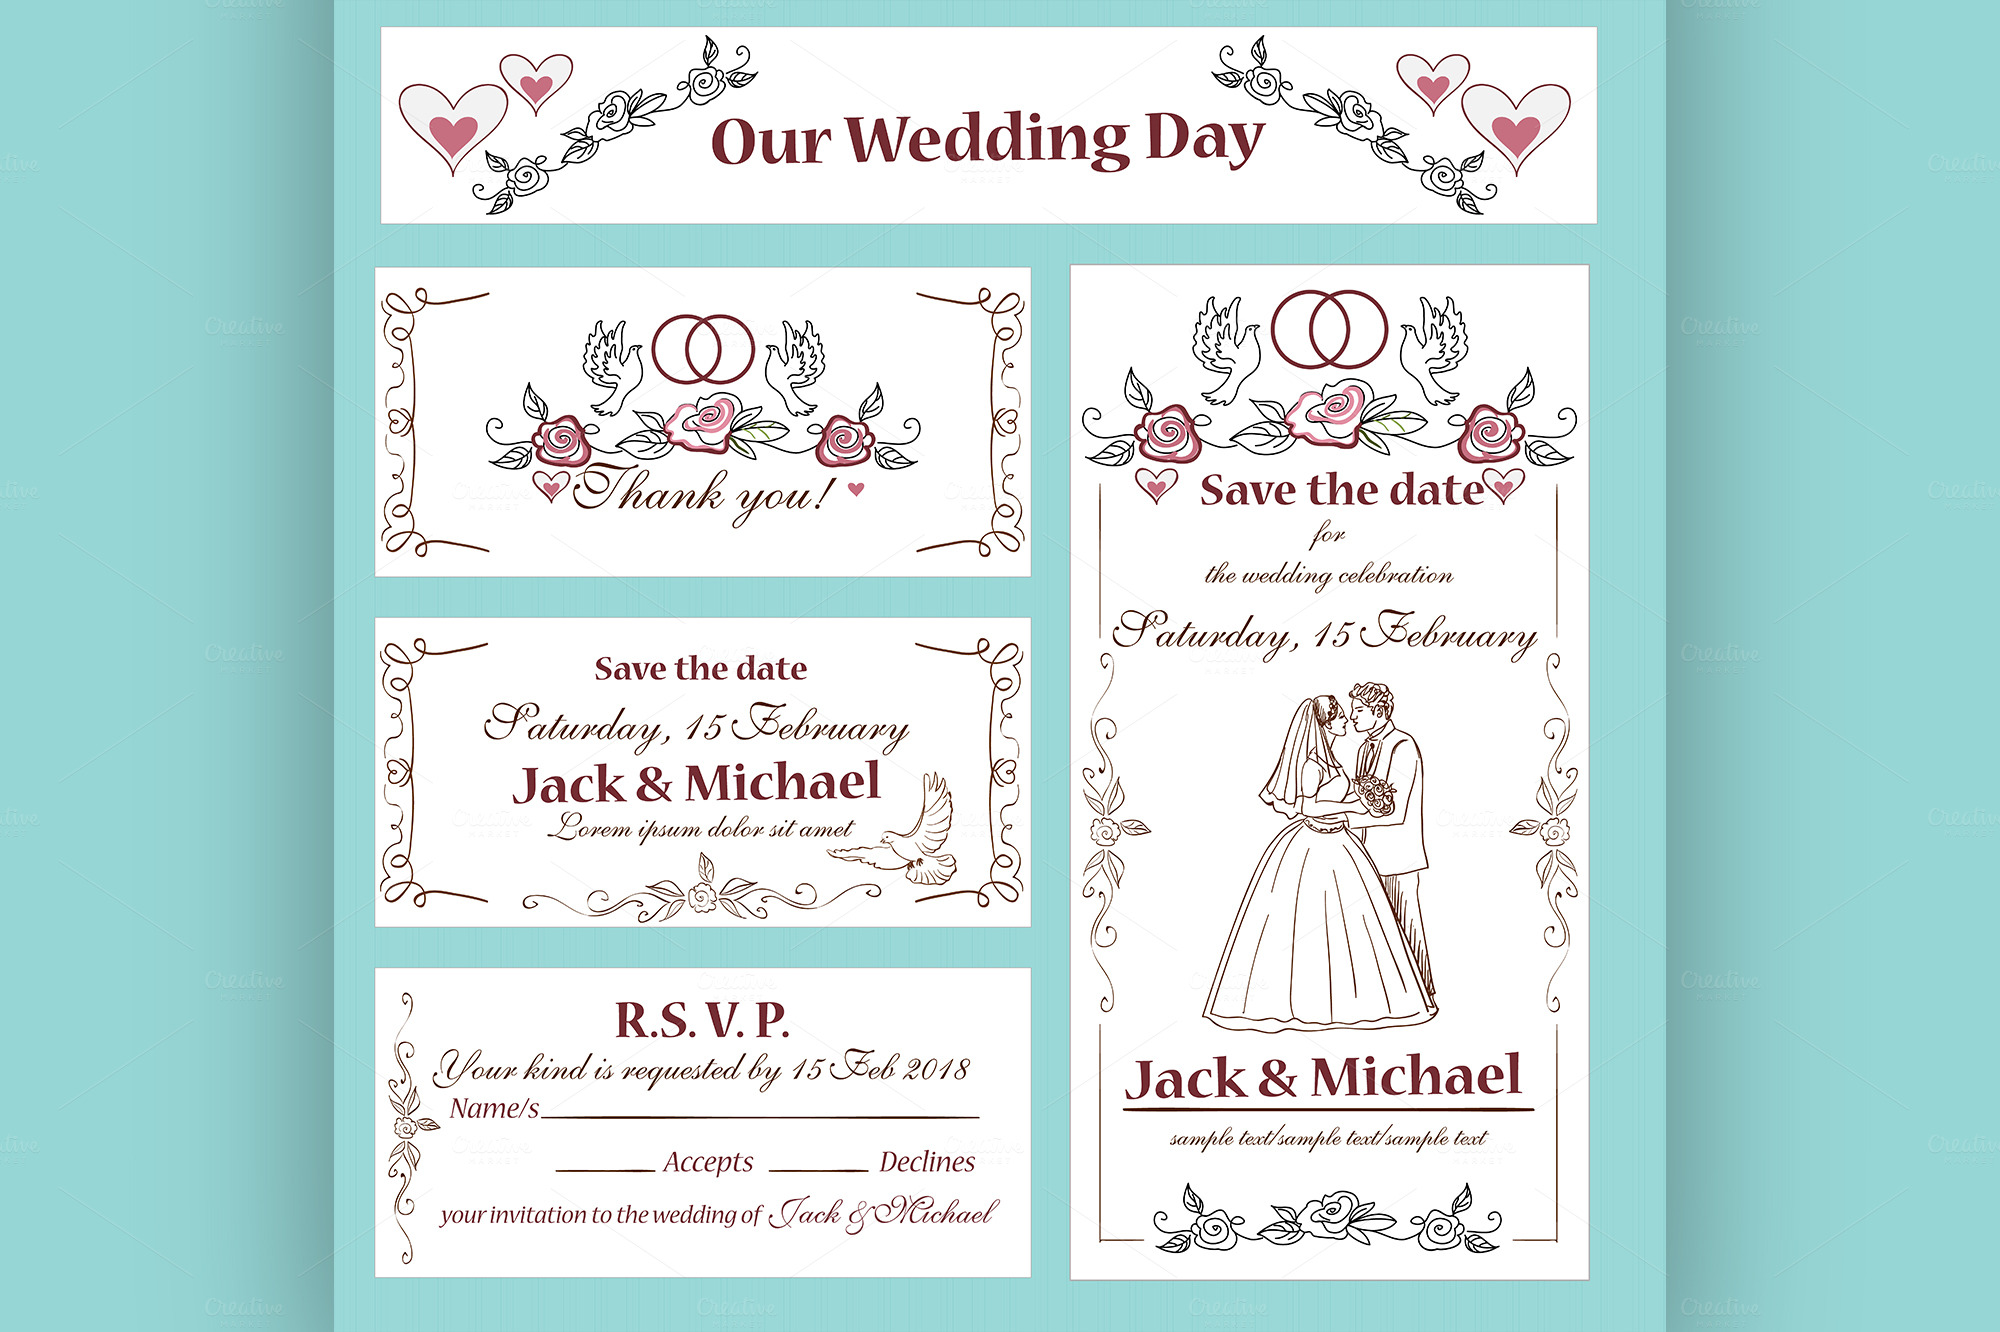 wedding invitation thank you card flyer templates on creative market. Black Bedroom Furniture Sets. Home Design Ideas